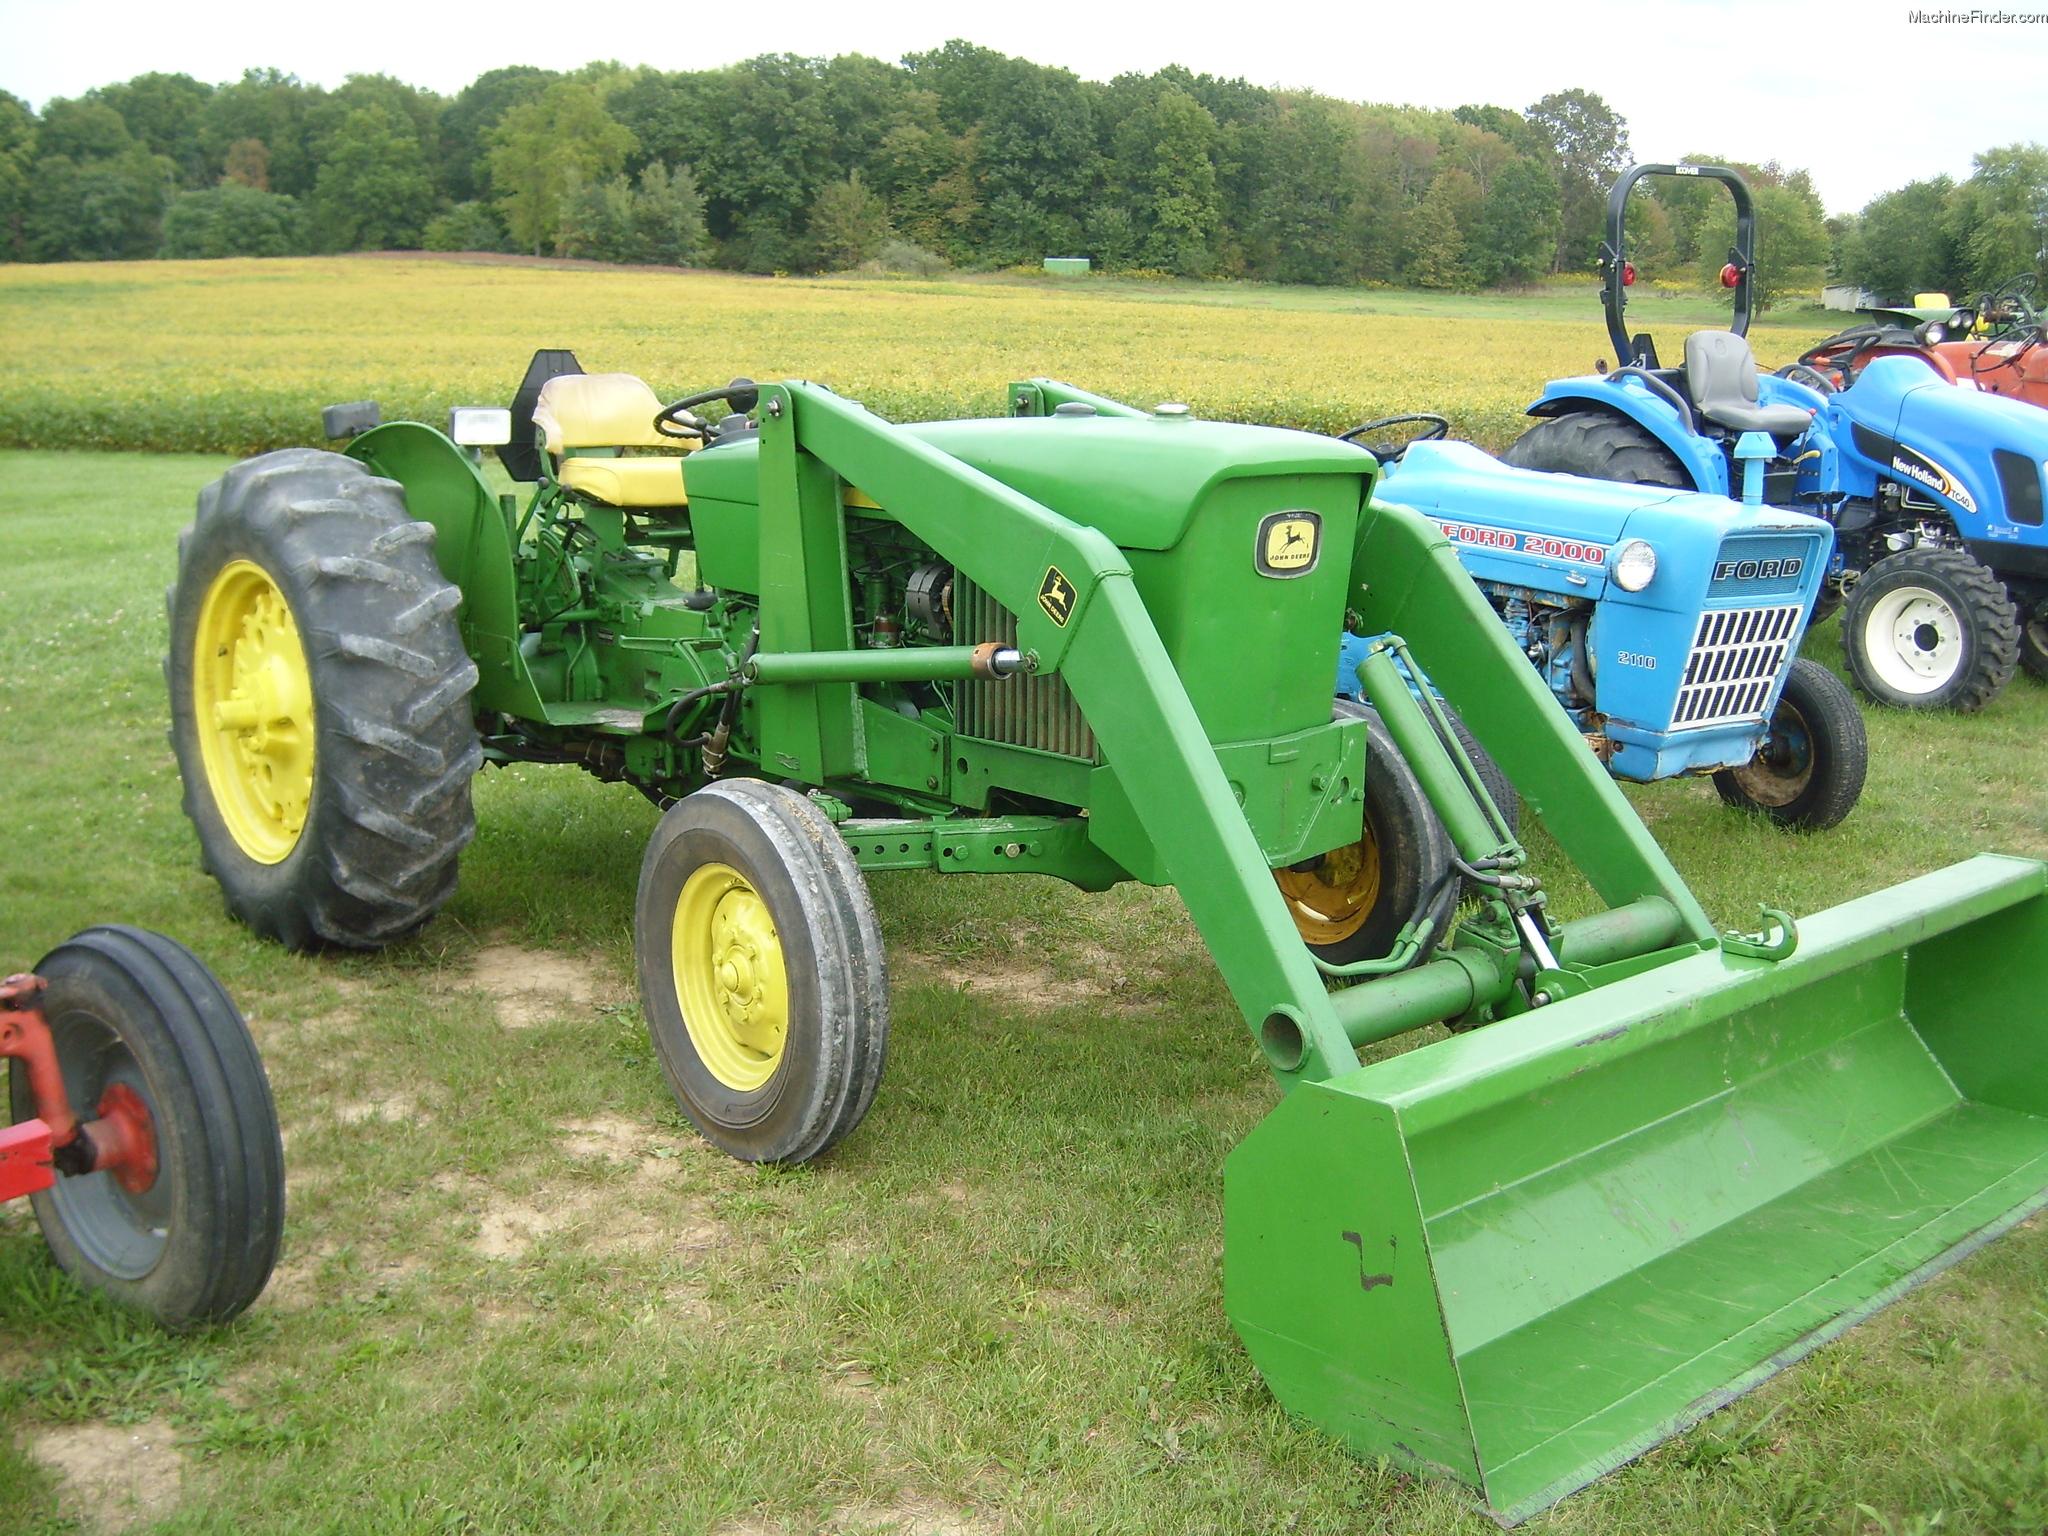 1966 John Deere 2020 Tractors - Utility (40-100hp) - John ...